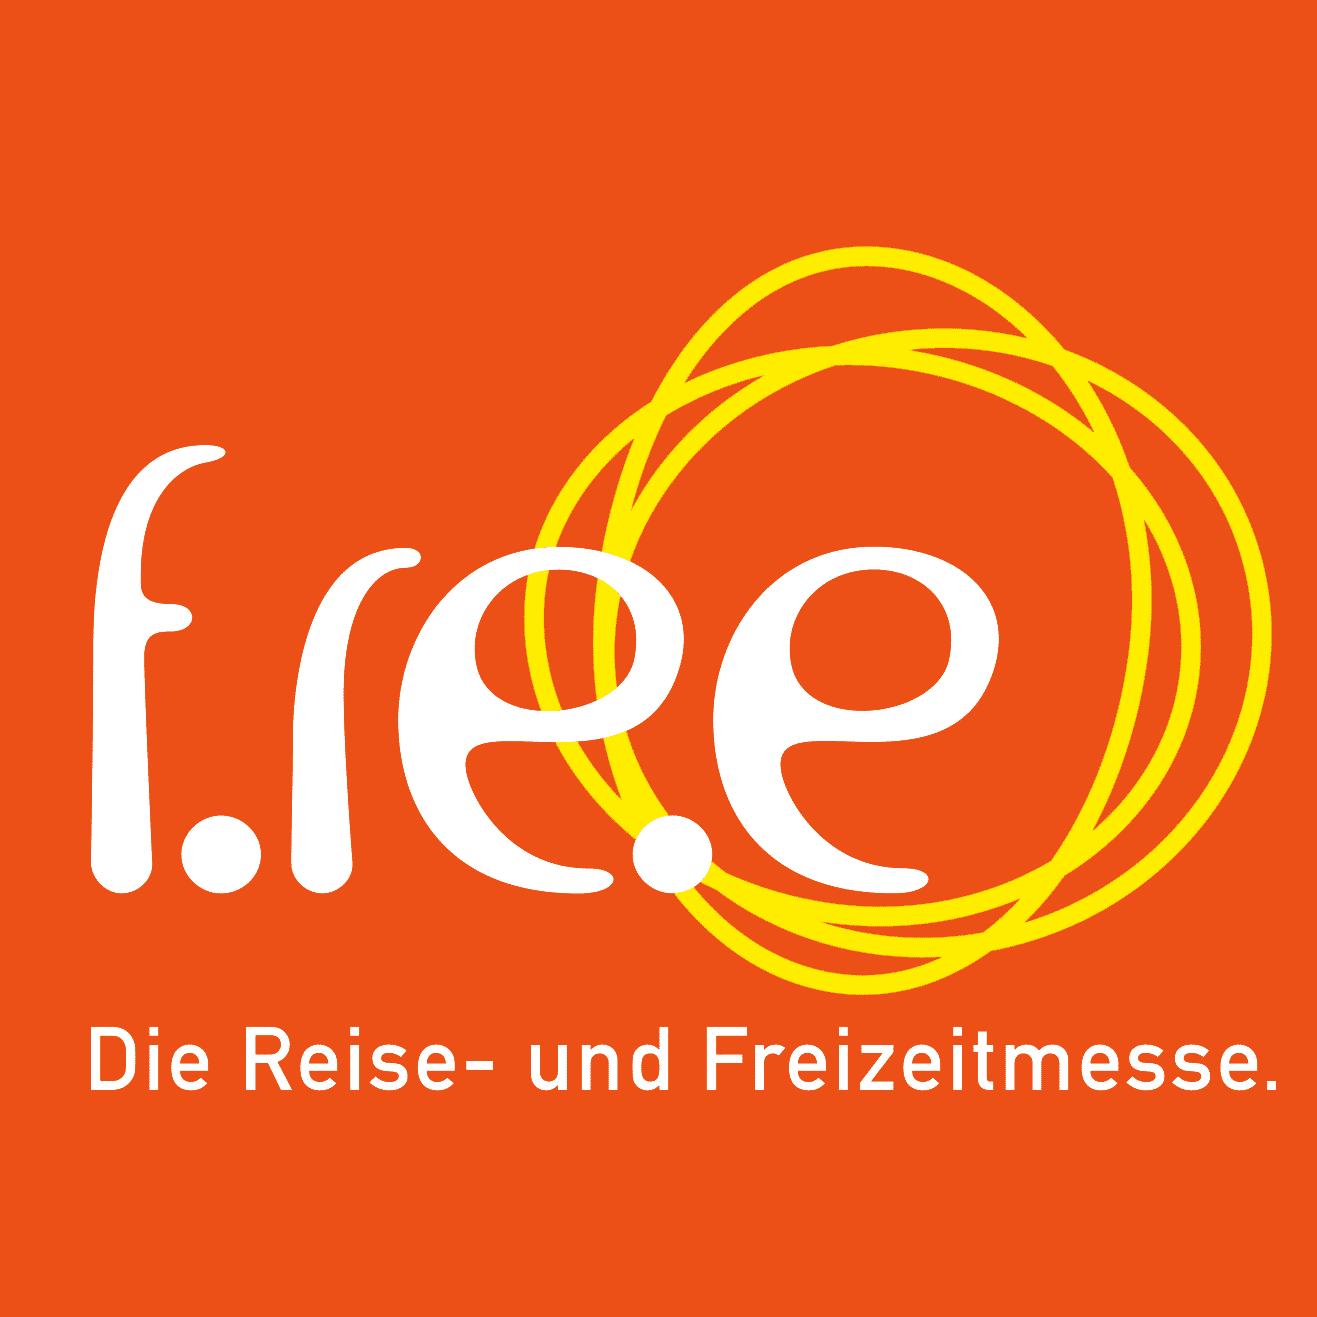 Free München Logo 2020